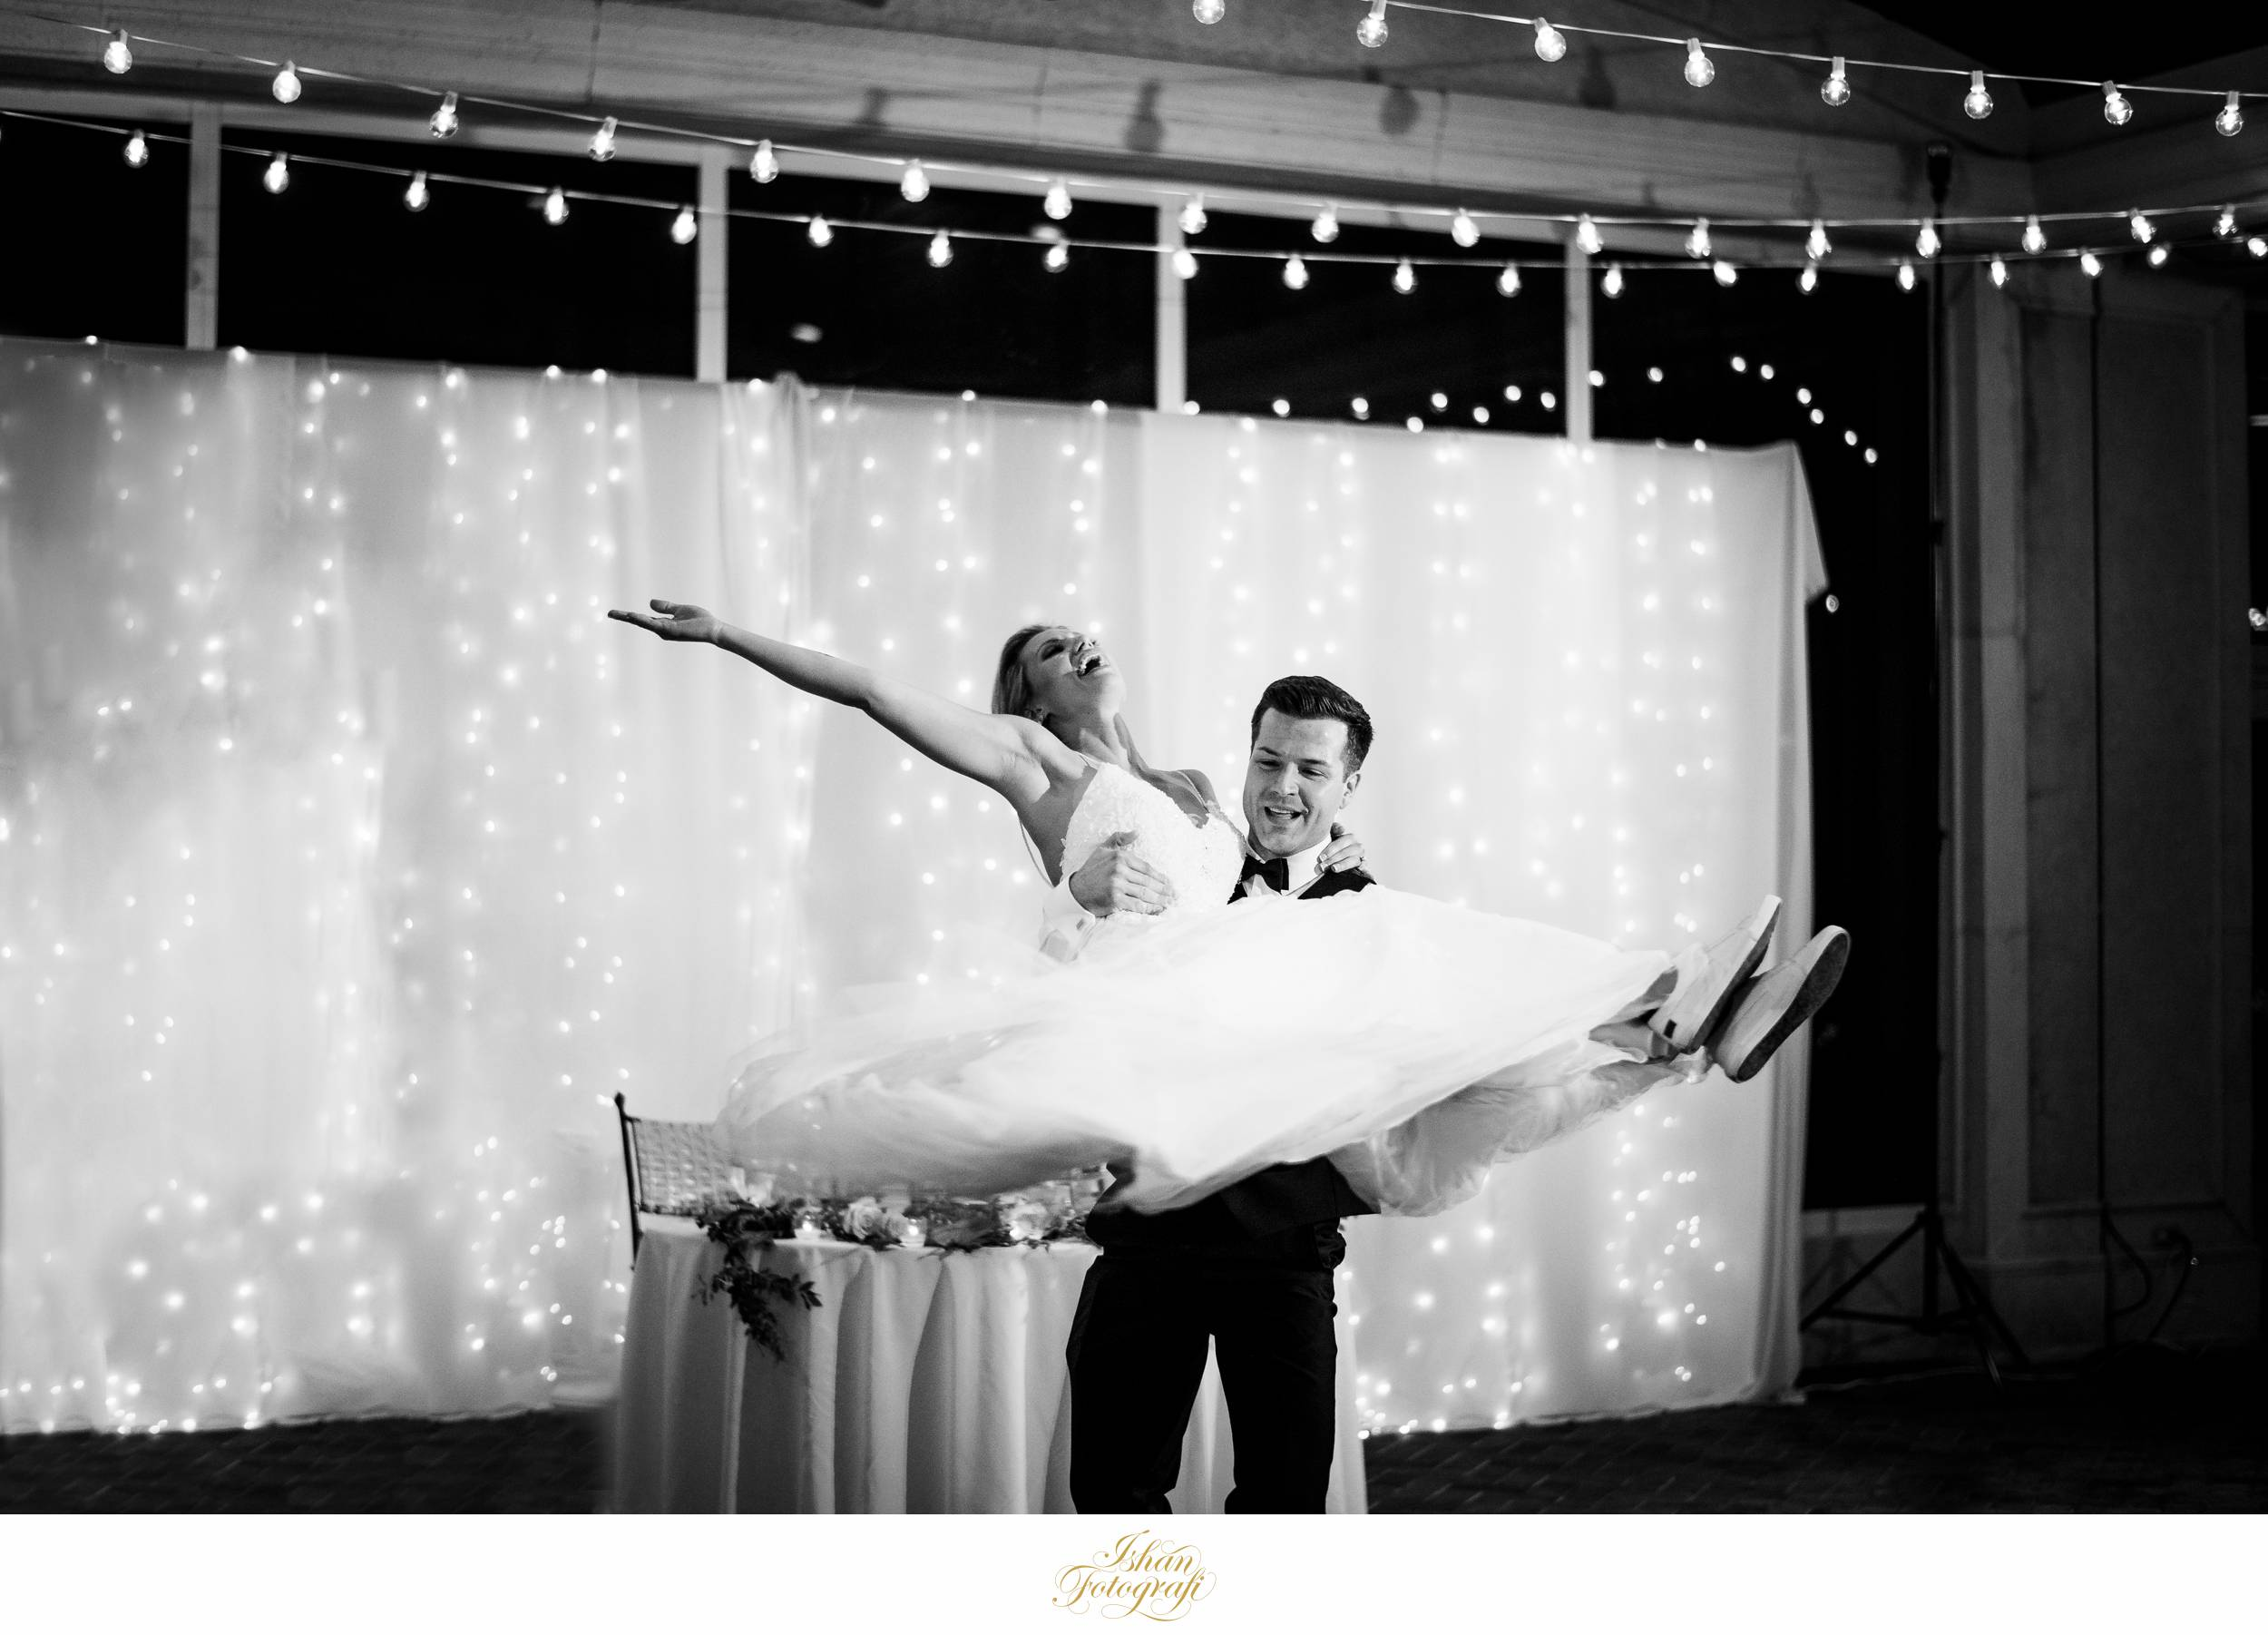 first-dance-wedding-reception-marco-ocean-beach-weddings